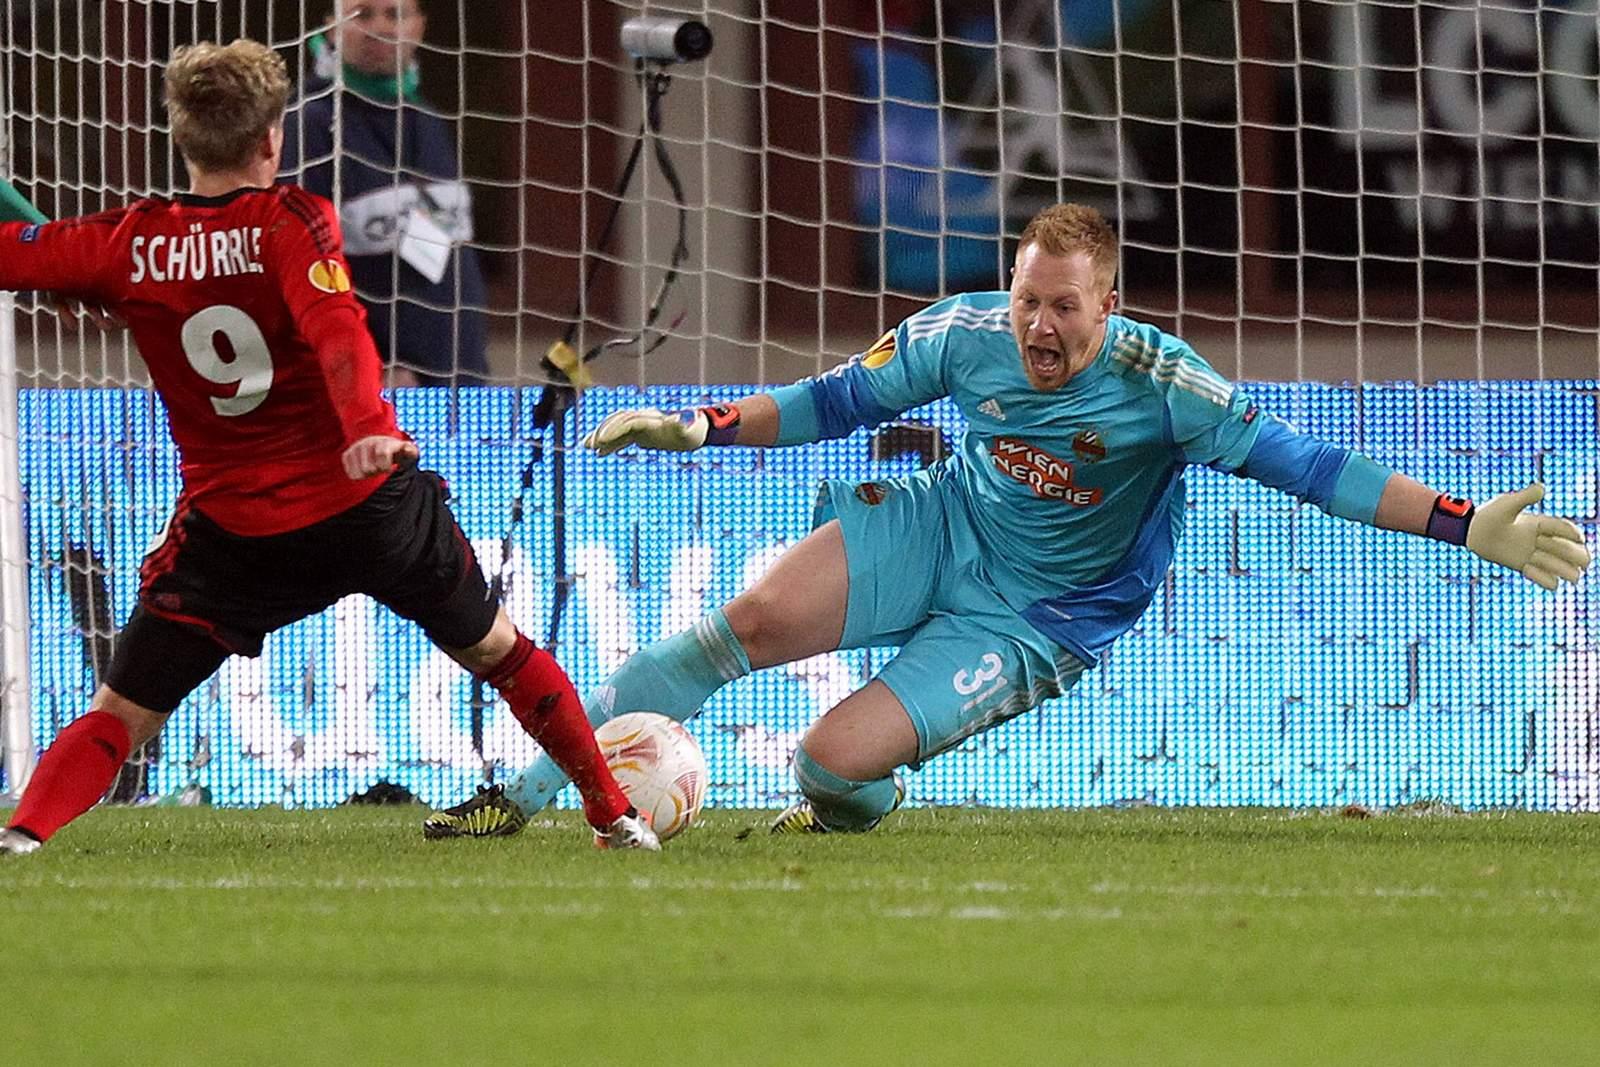 Lukas Königshofer (r.) gegen Leverkusens Andre Schürrle.